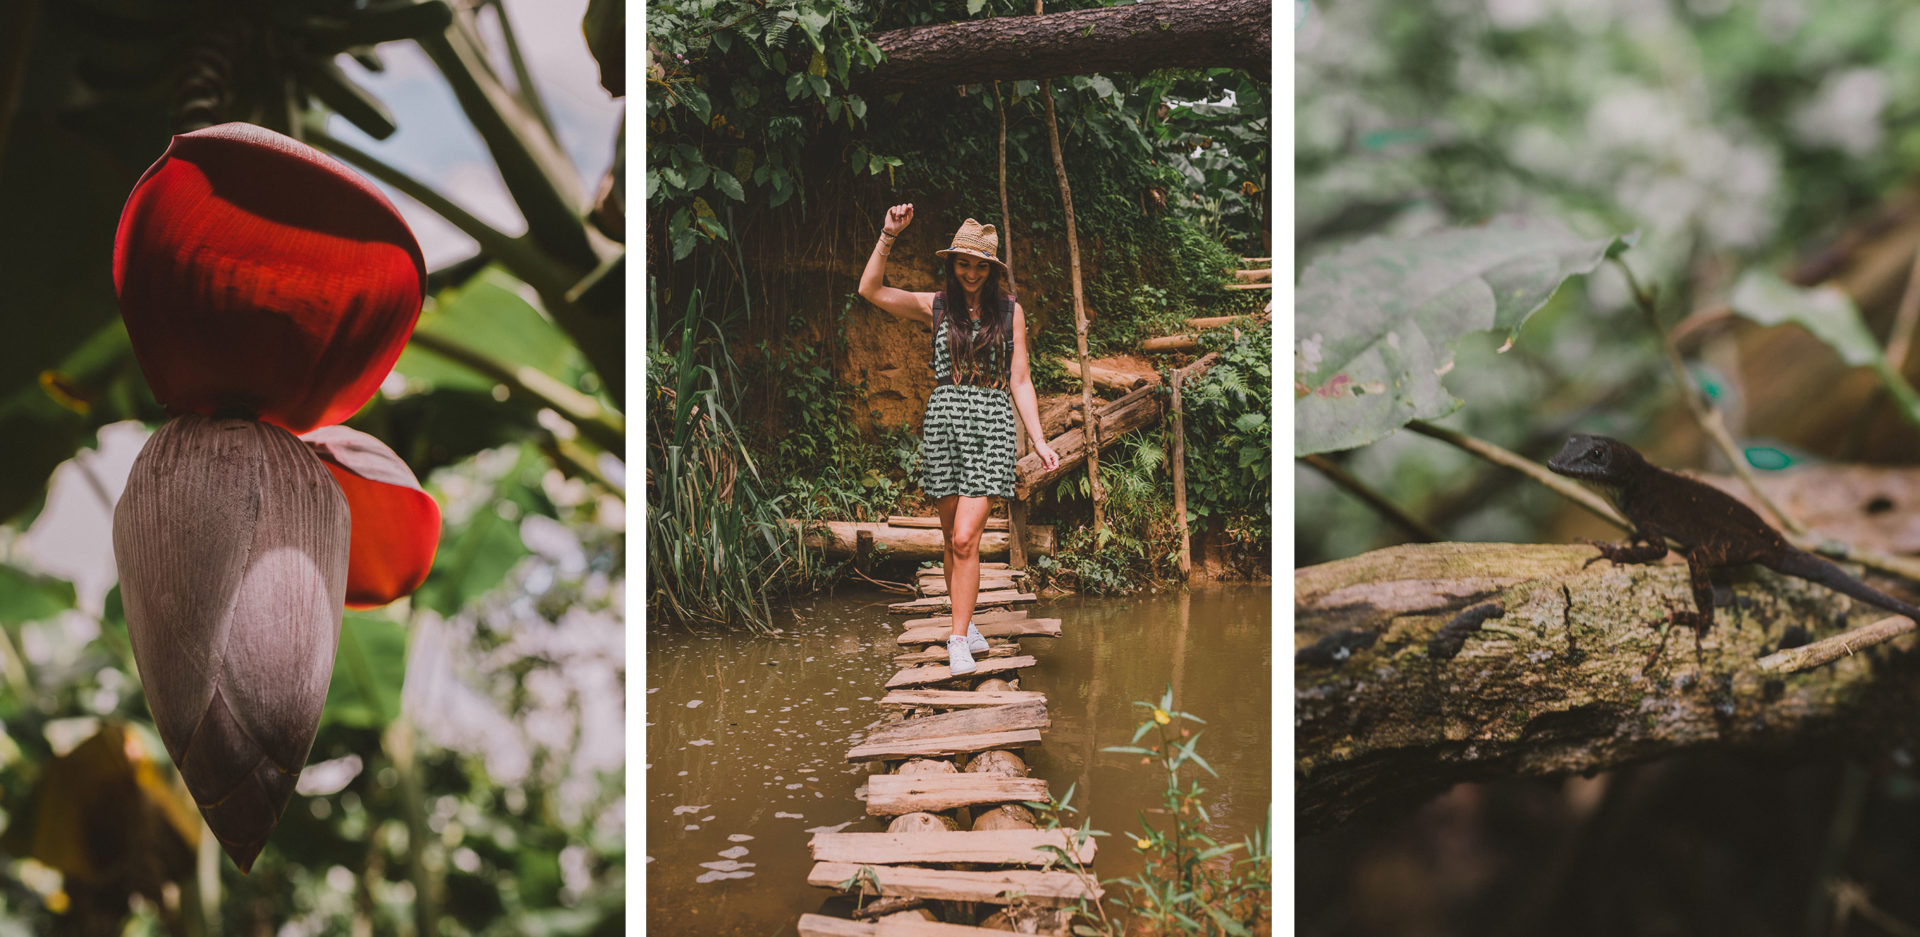 Découvrir la nature luxuriante de Cuba